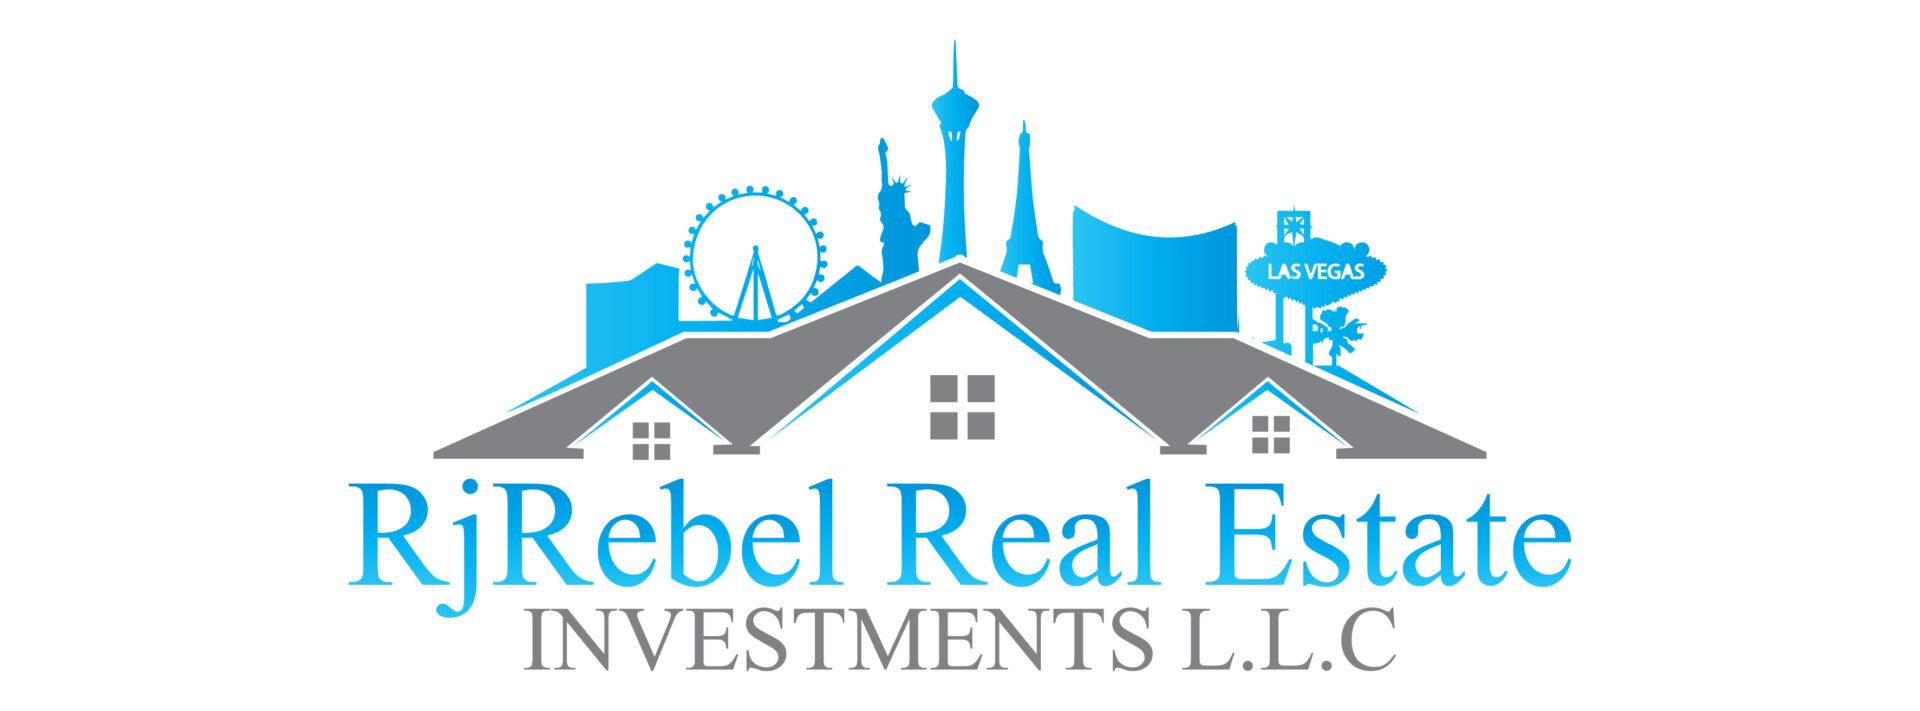 RjRebel Buys Houses logo